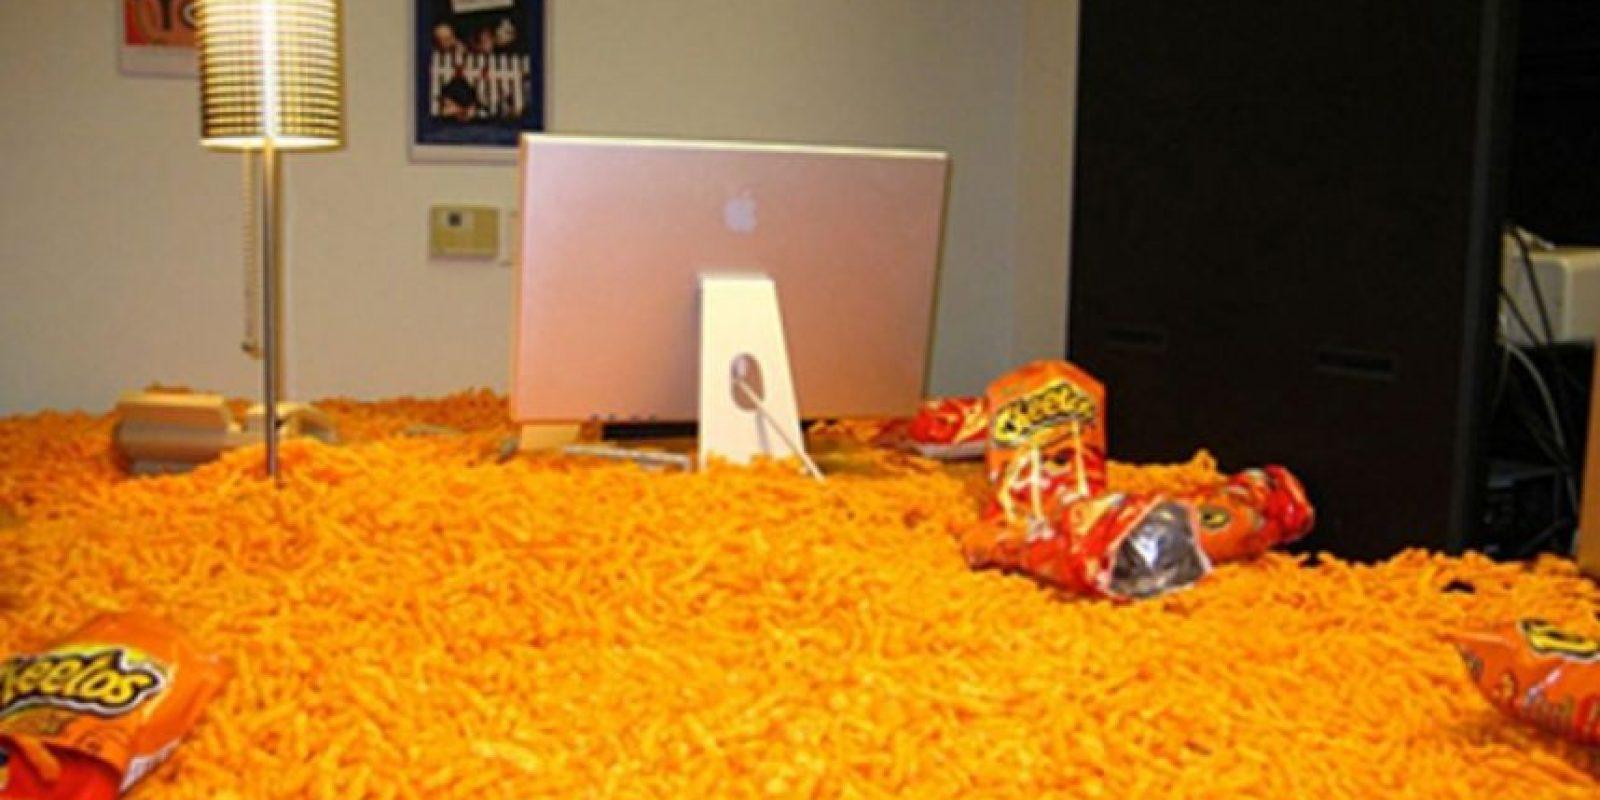 Los cheetos. Foto:Prankked